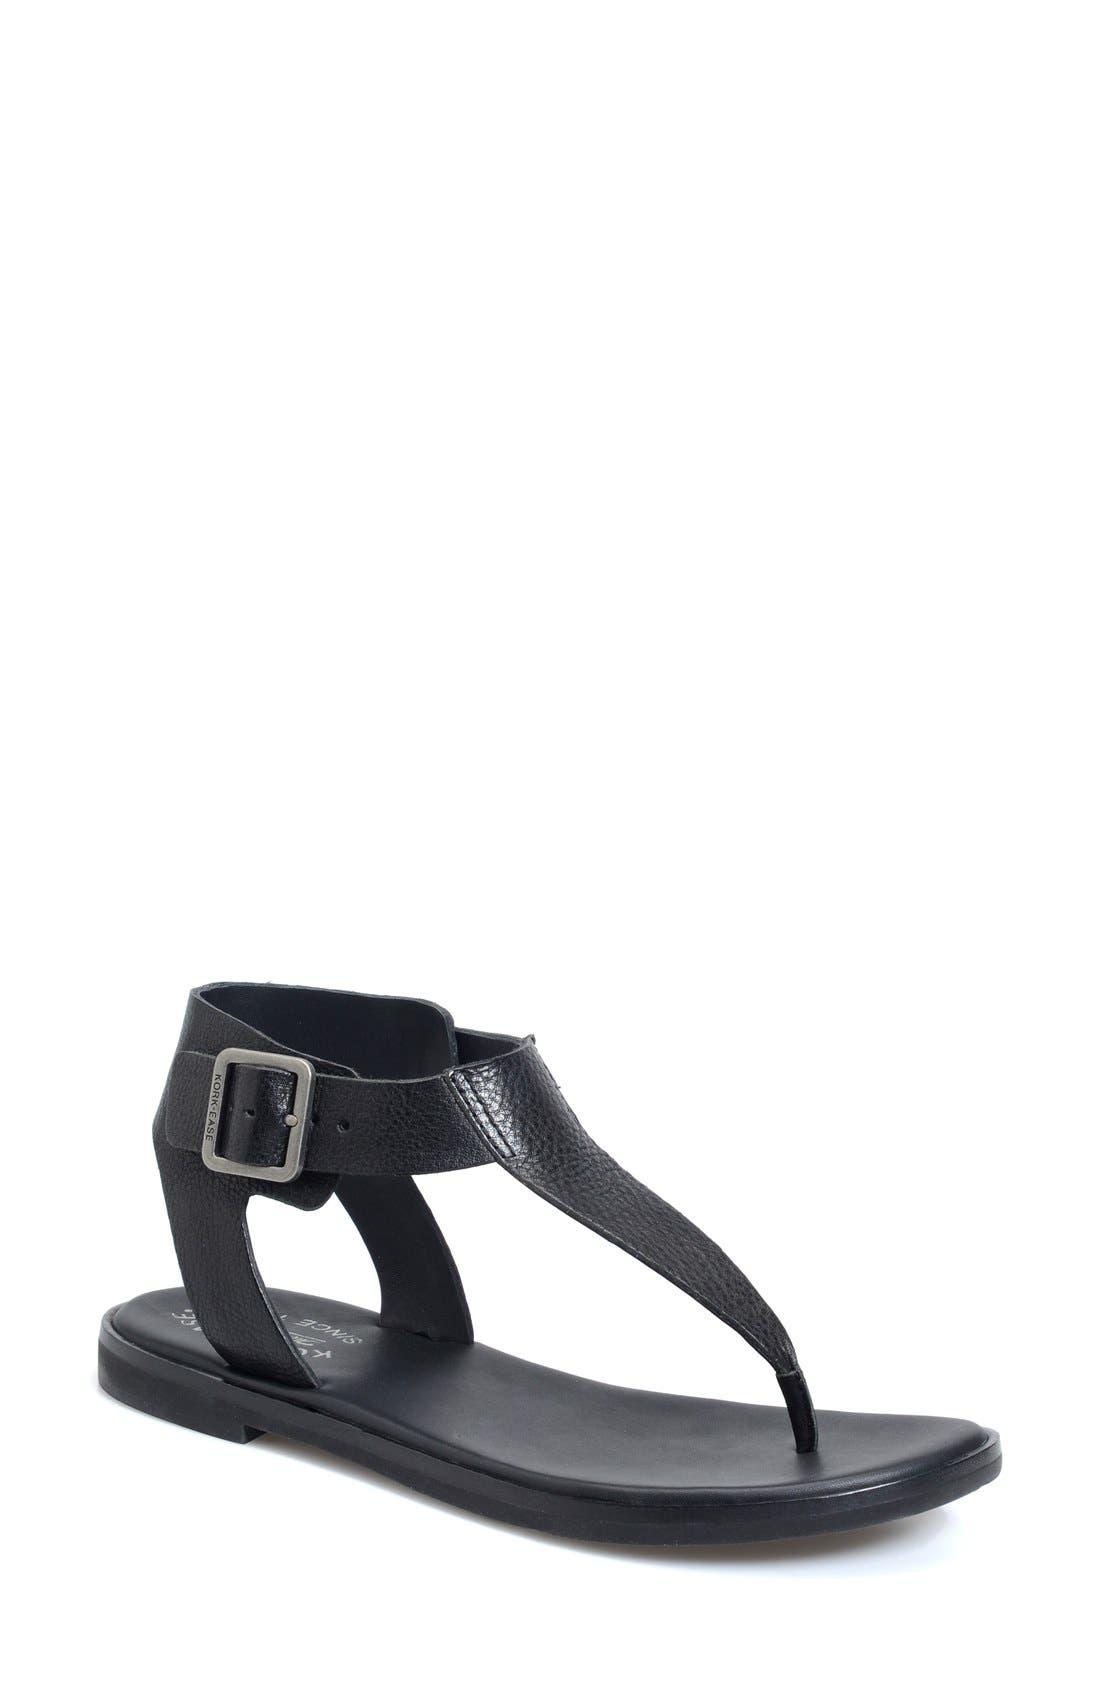 'Catriona' Flat Sandal,                         Main,                         color, 001